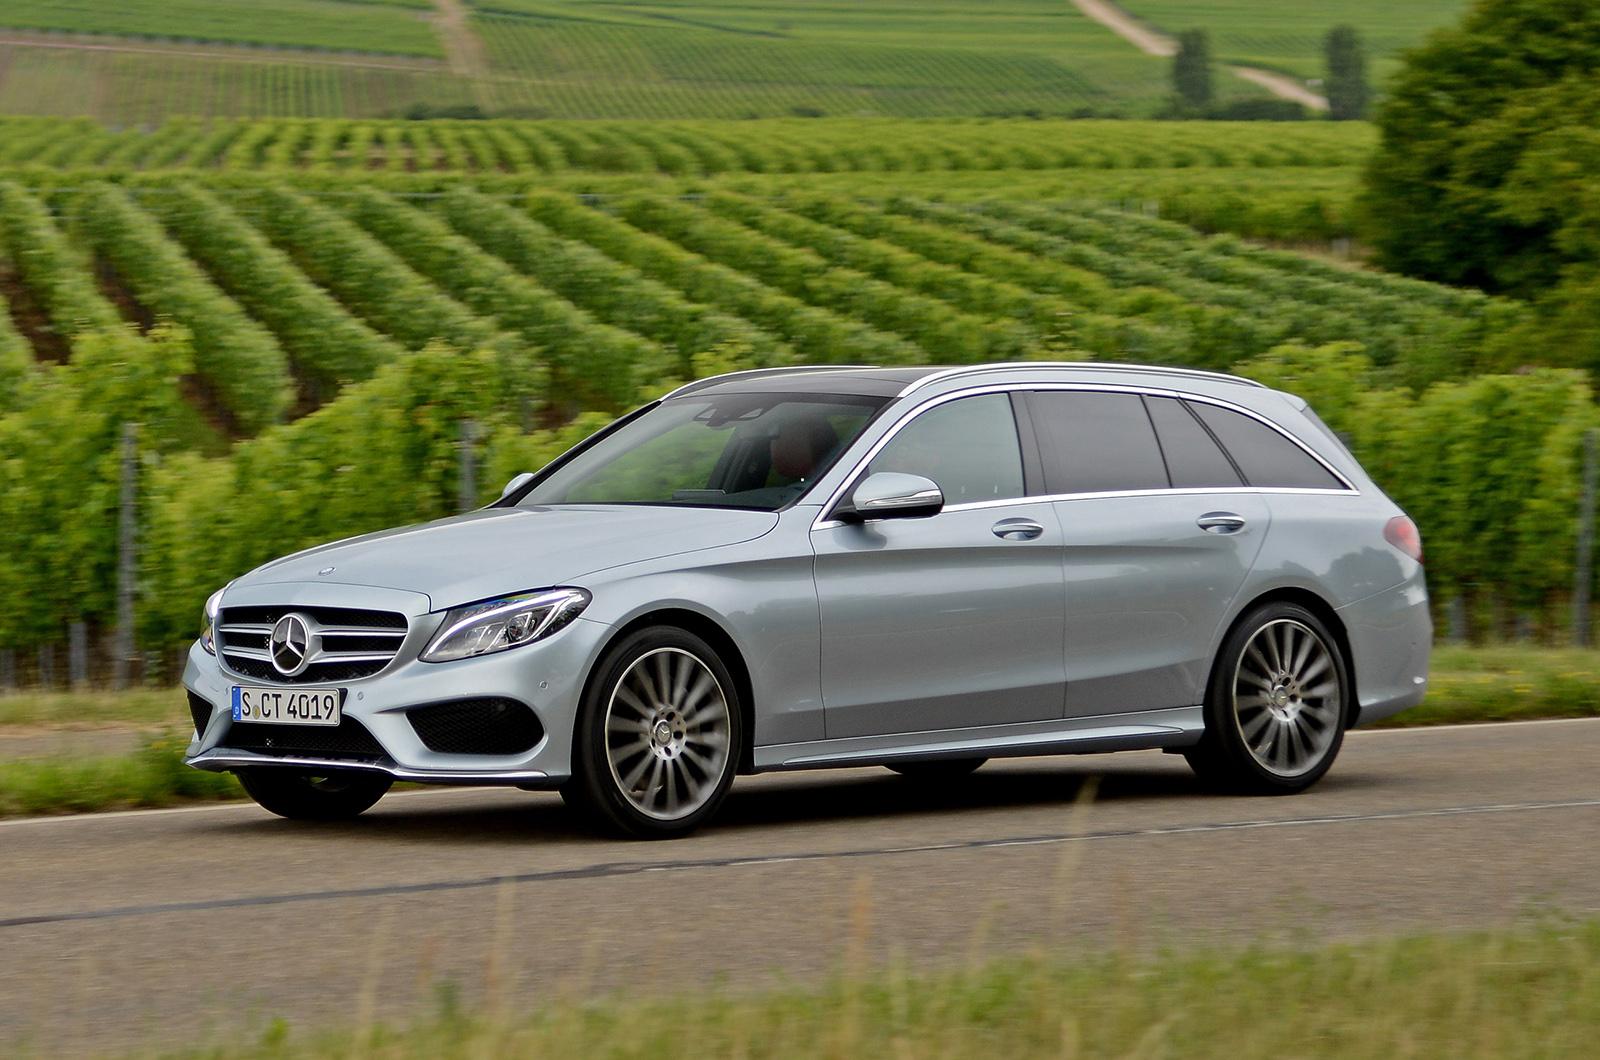 Mercedes benz c class c250 bluetec estate first drive for Mercedes benz c250 review